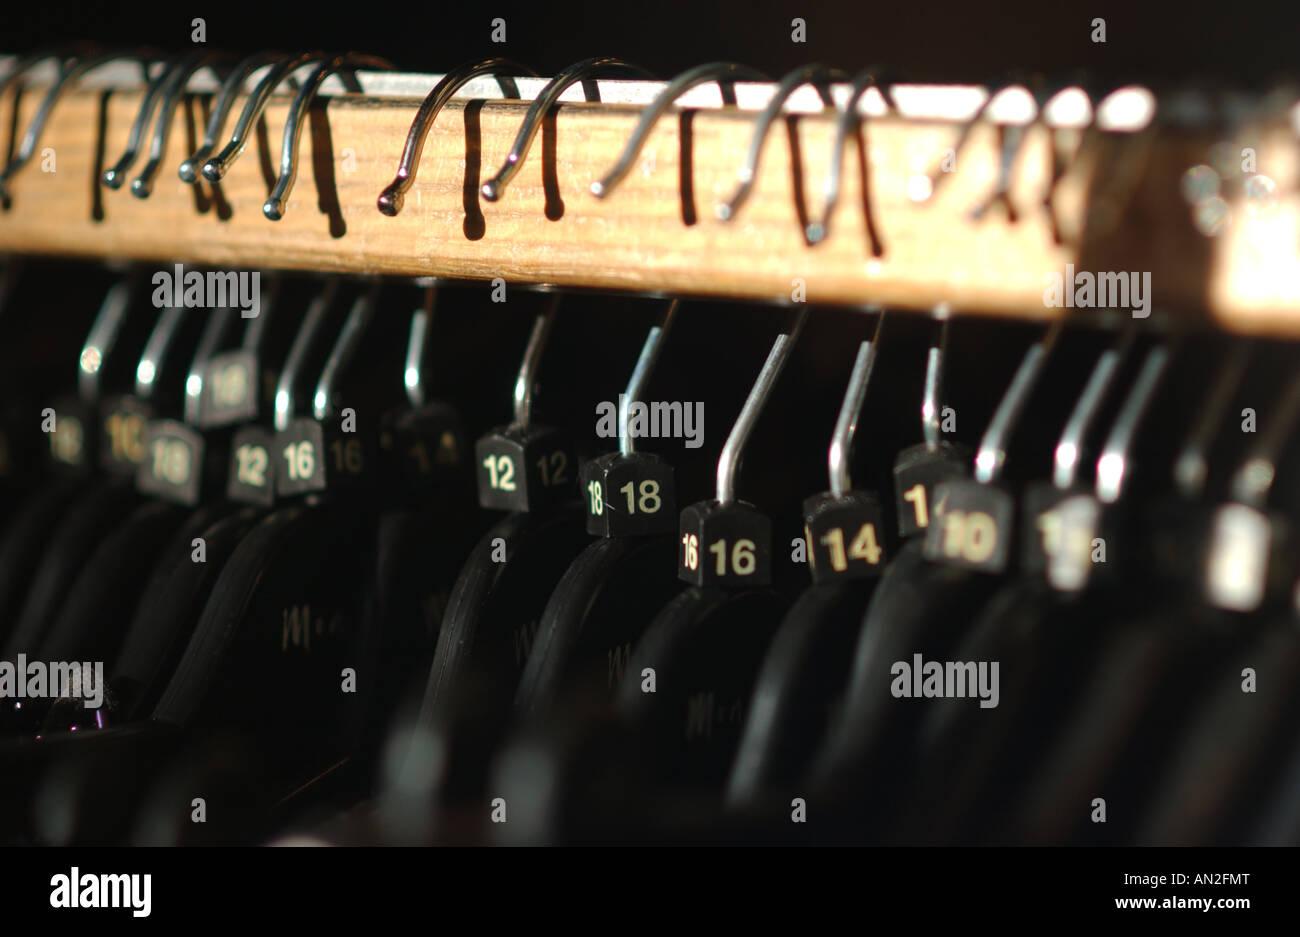 Hangers On Rail - Stock Image